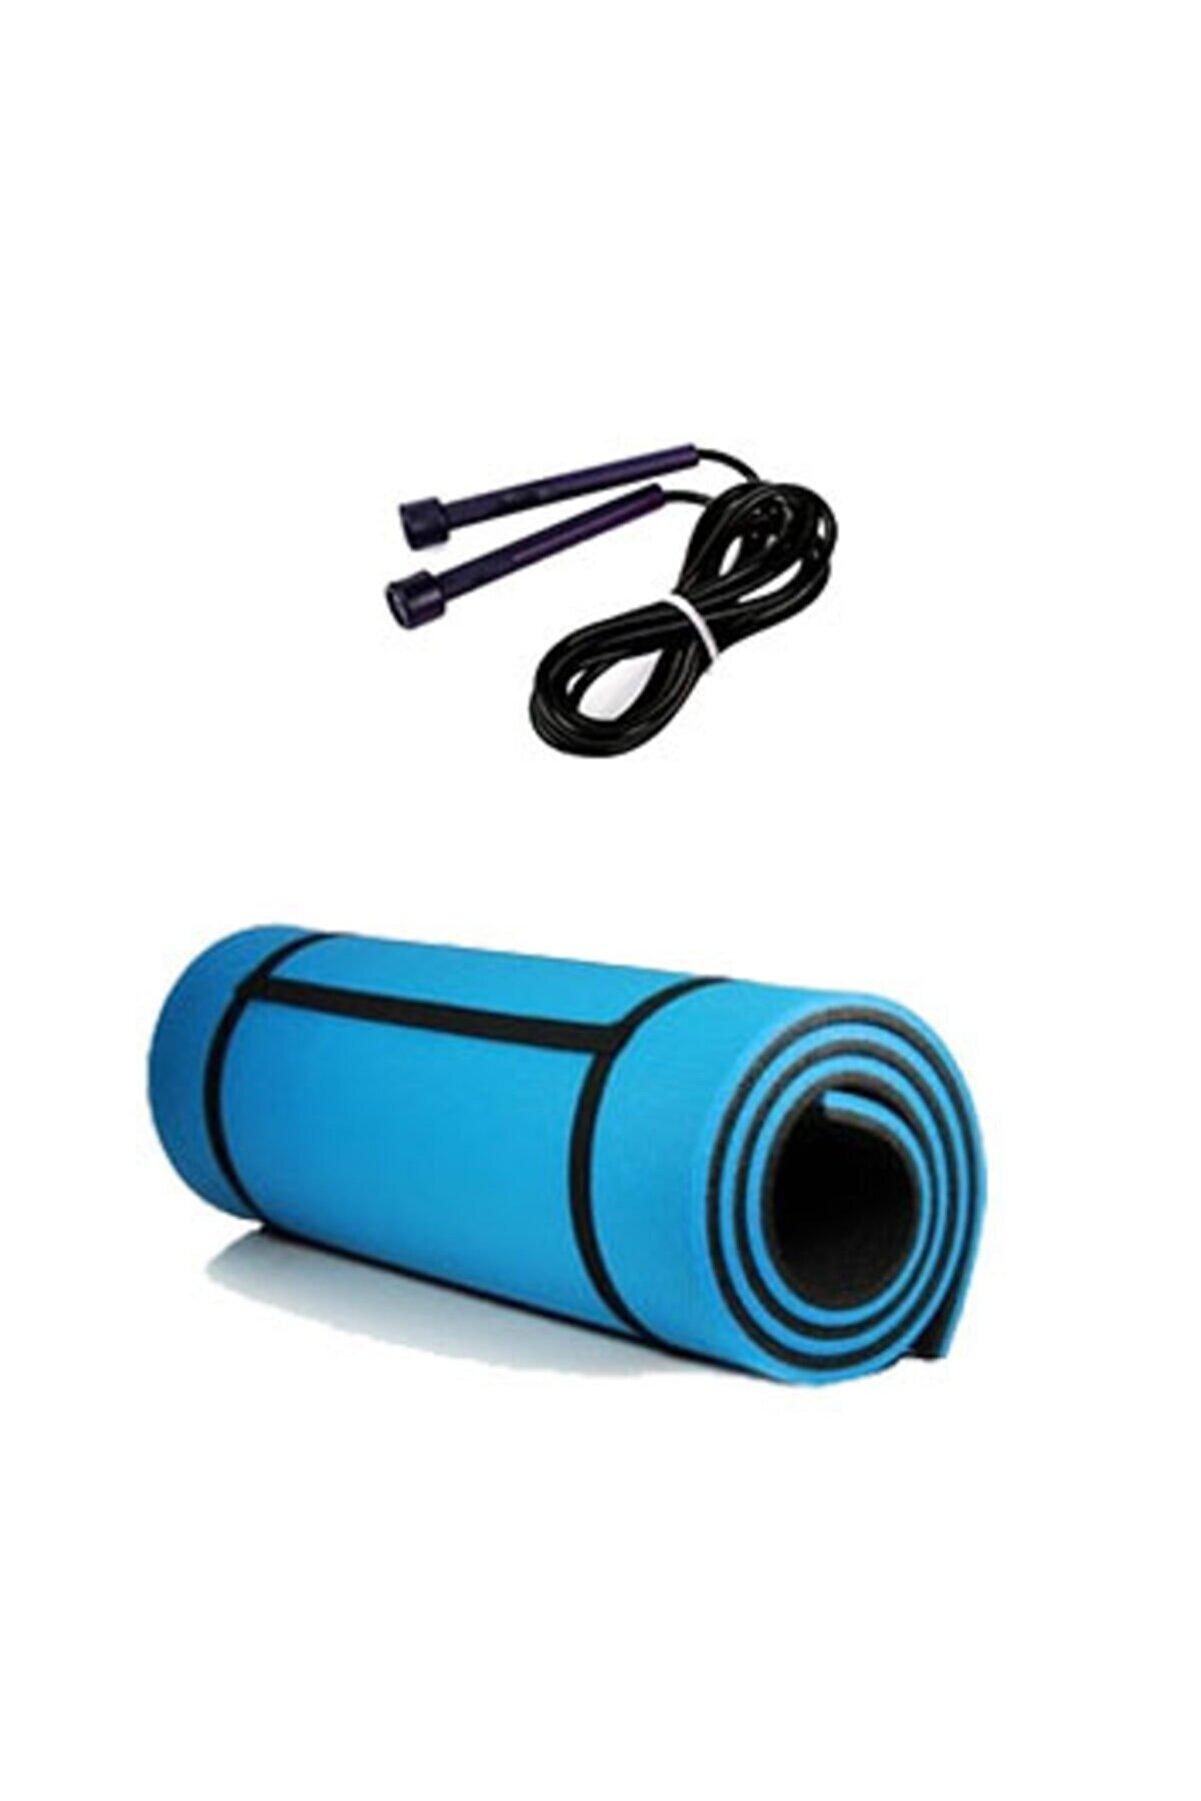 BlackFit Pilates Ve Yoga Seti Mavi 10mm Pilates Minderi & Mat'ı Siyah Atlama Ipi 2'li